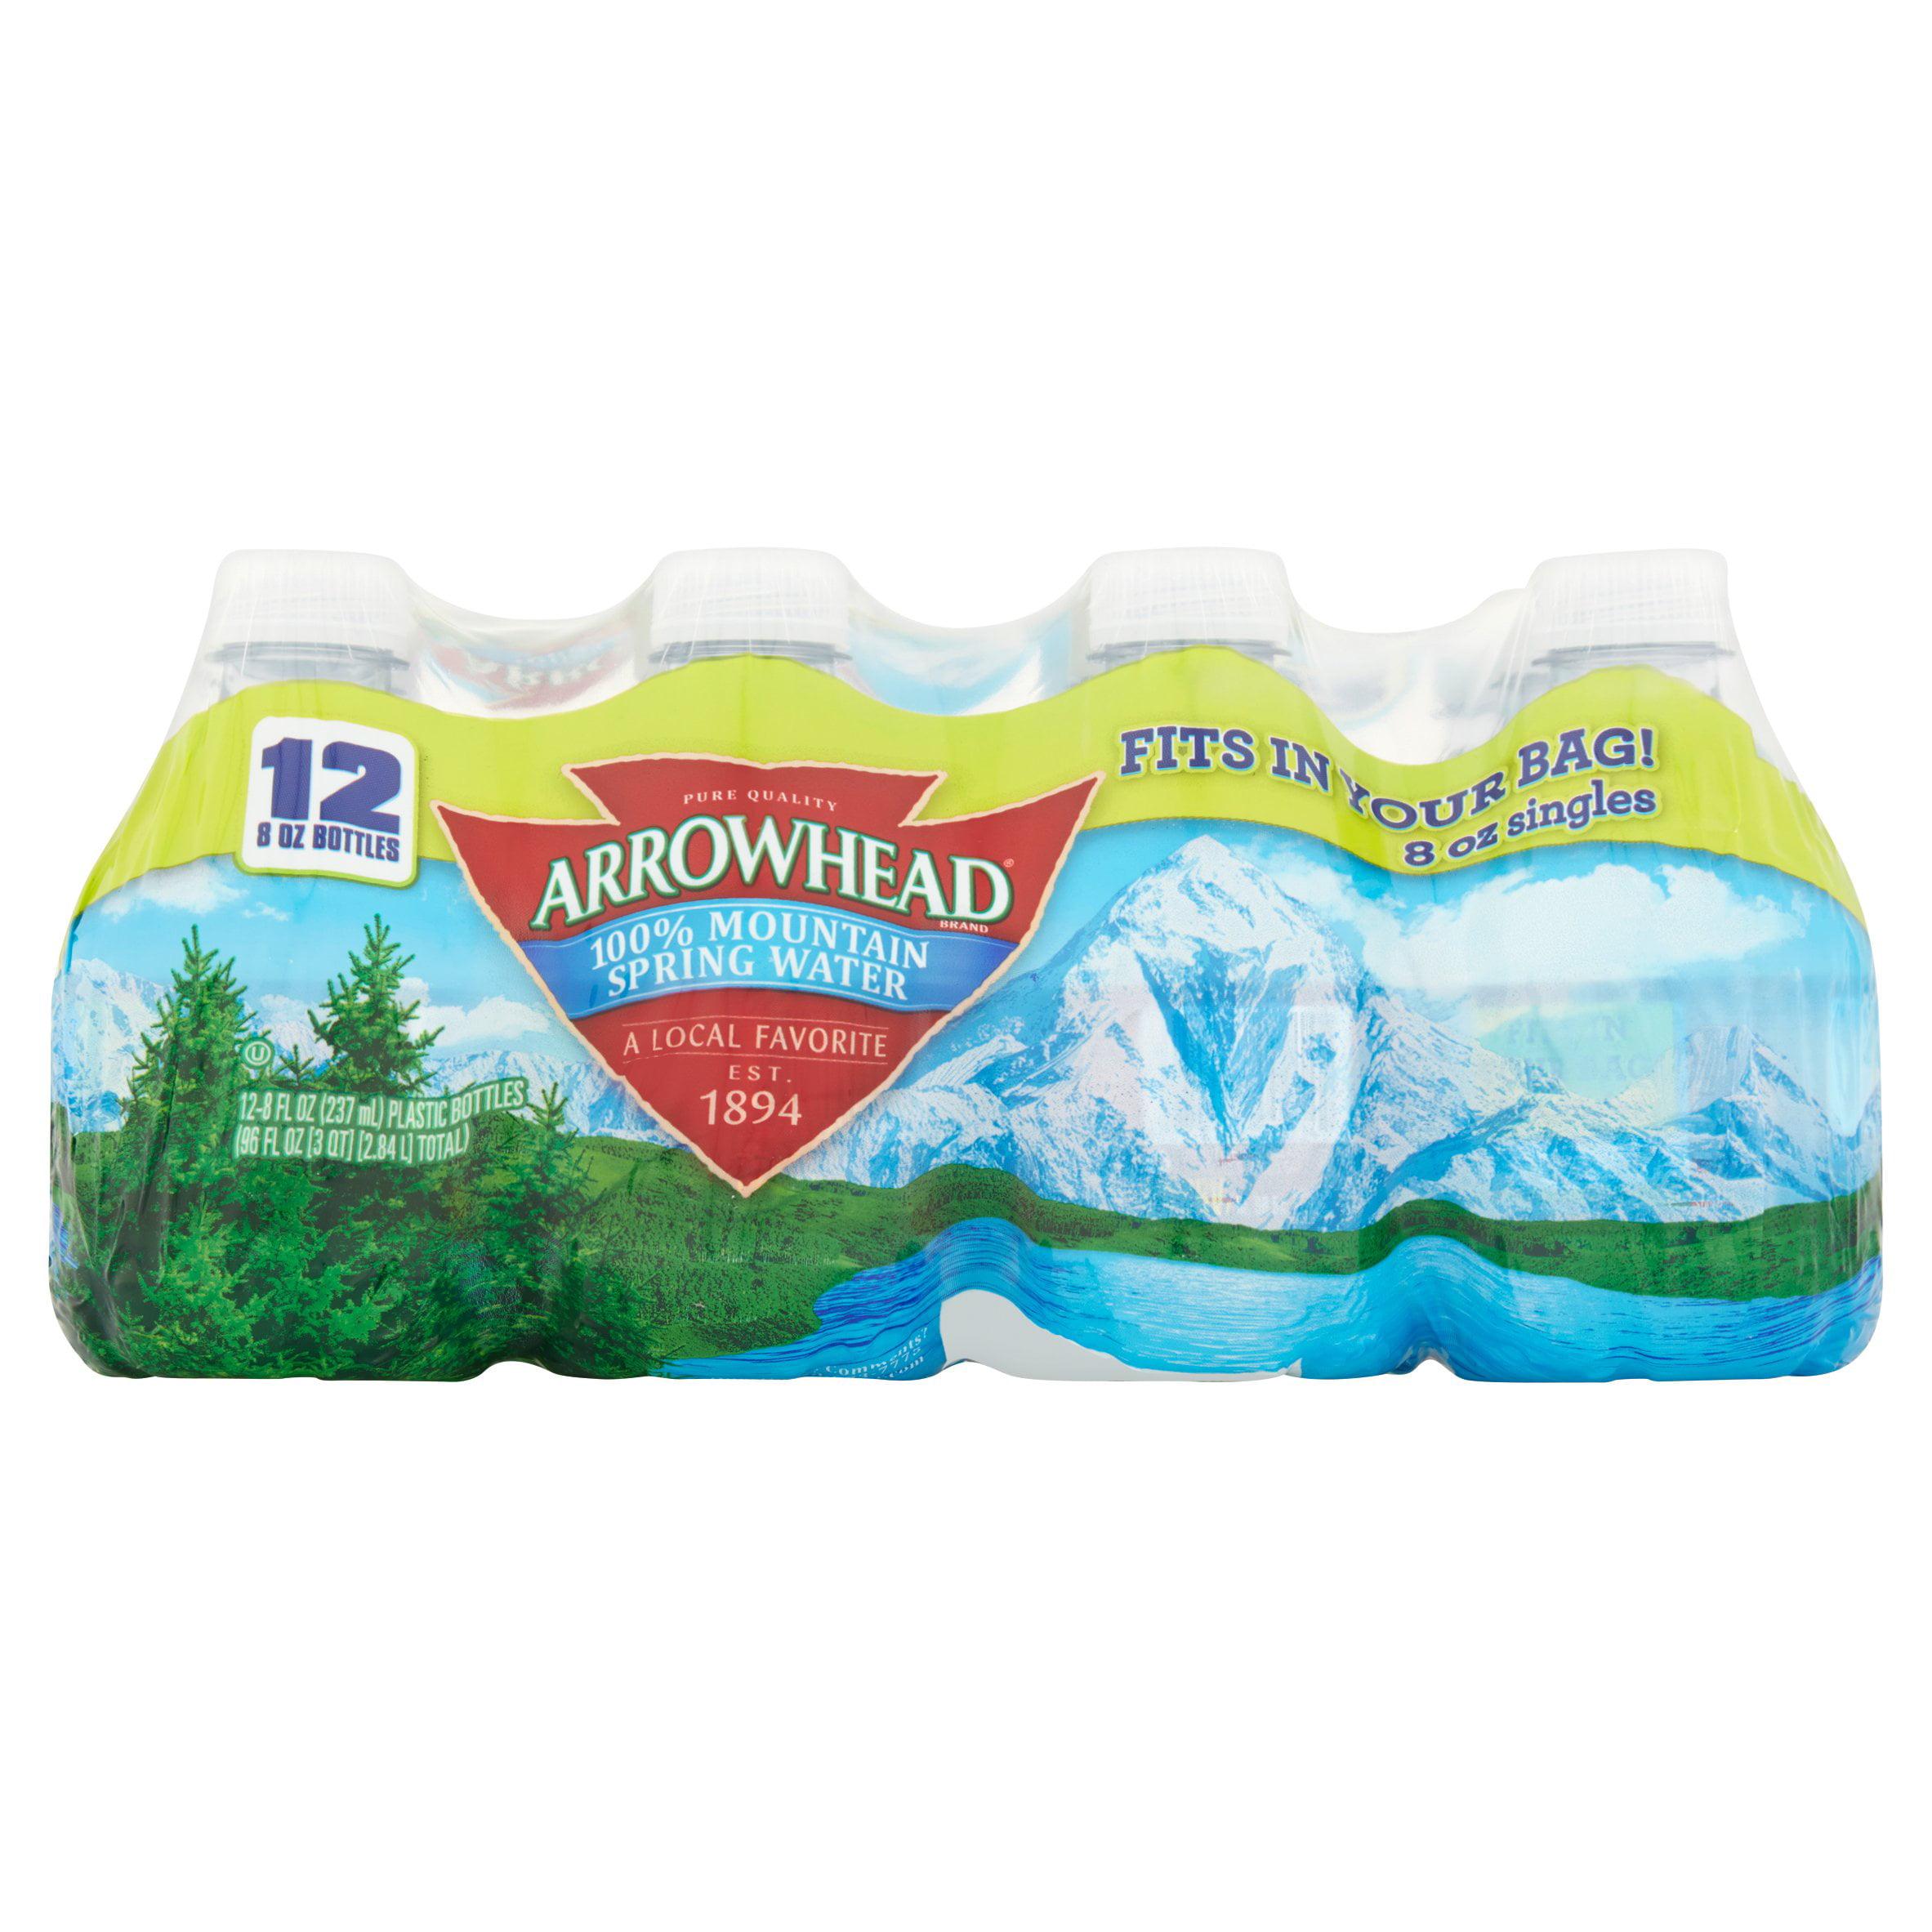 ArrowHead 100% Mountain Spring Water 12 x 8fl oz (96fl oz) by Nestlé Waters North America Inc.